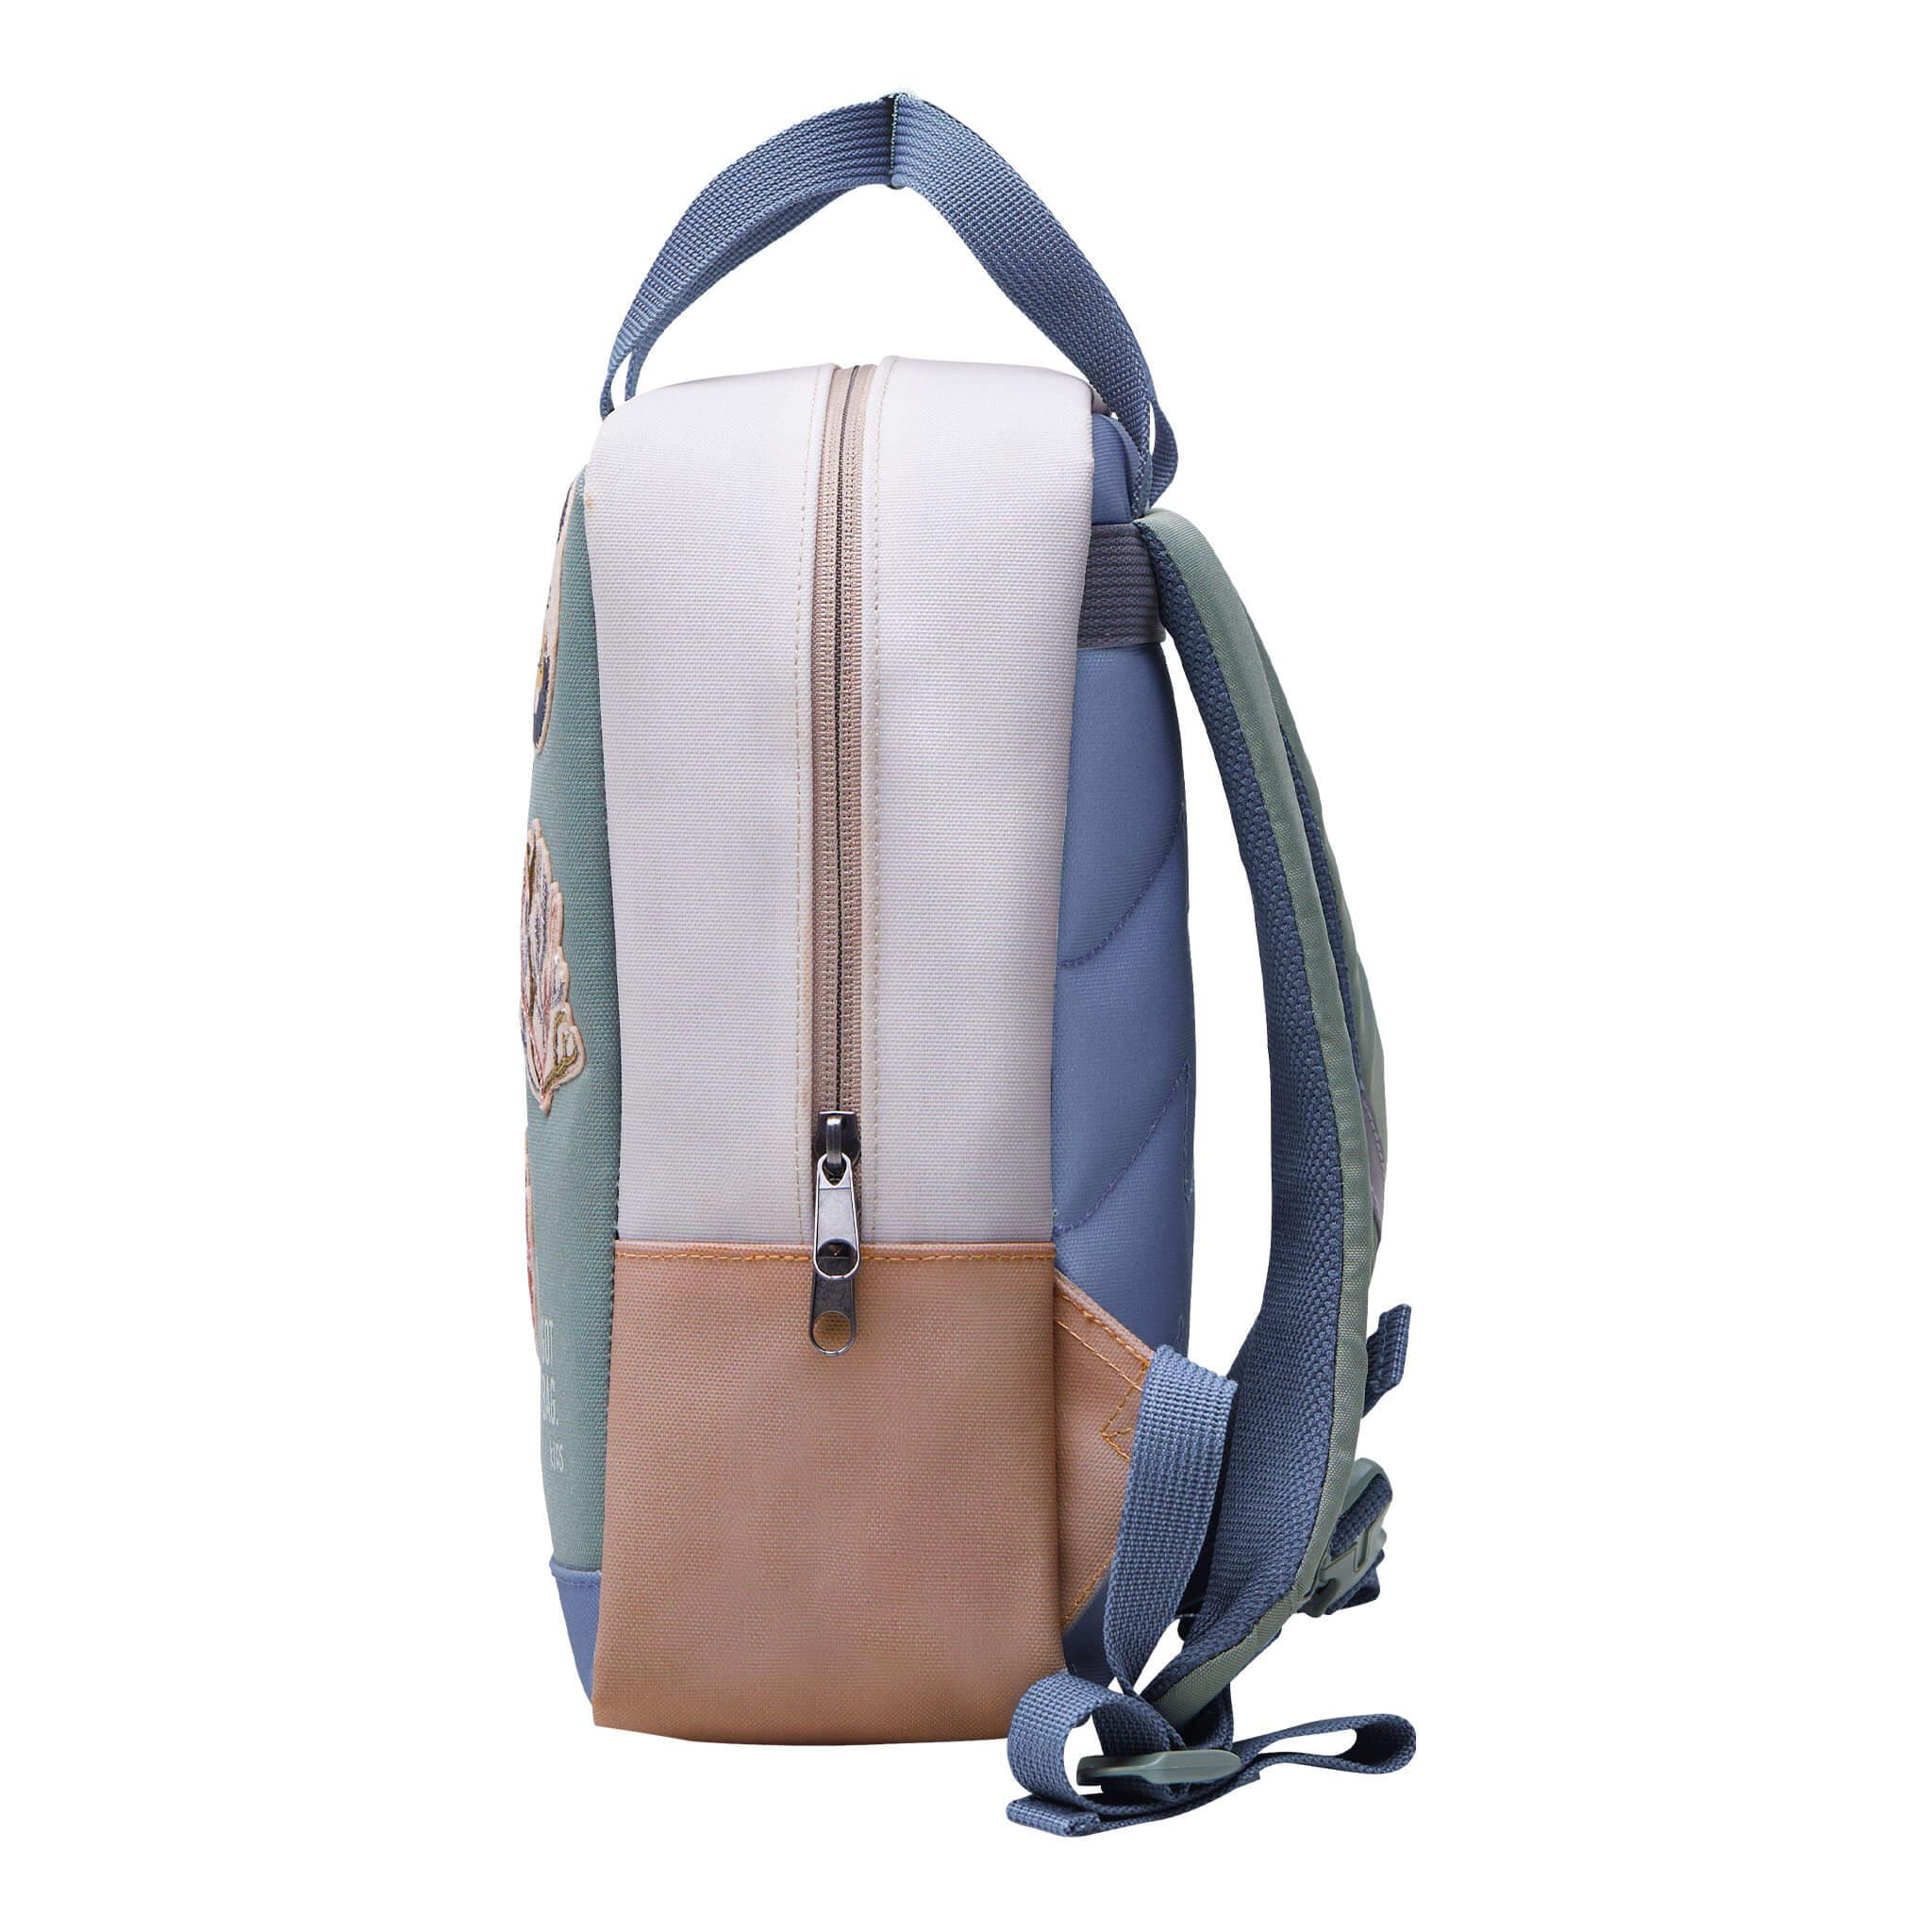 Got Bag Kids Collection- Daypack Mini - 5 Liter - Reef Multi